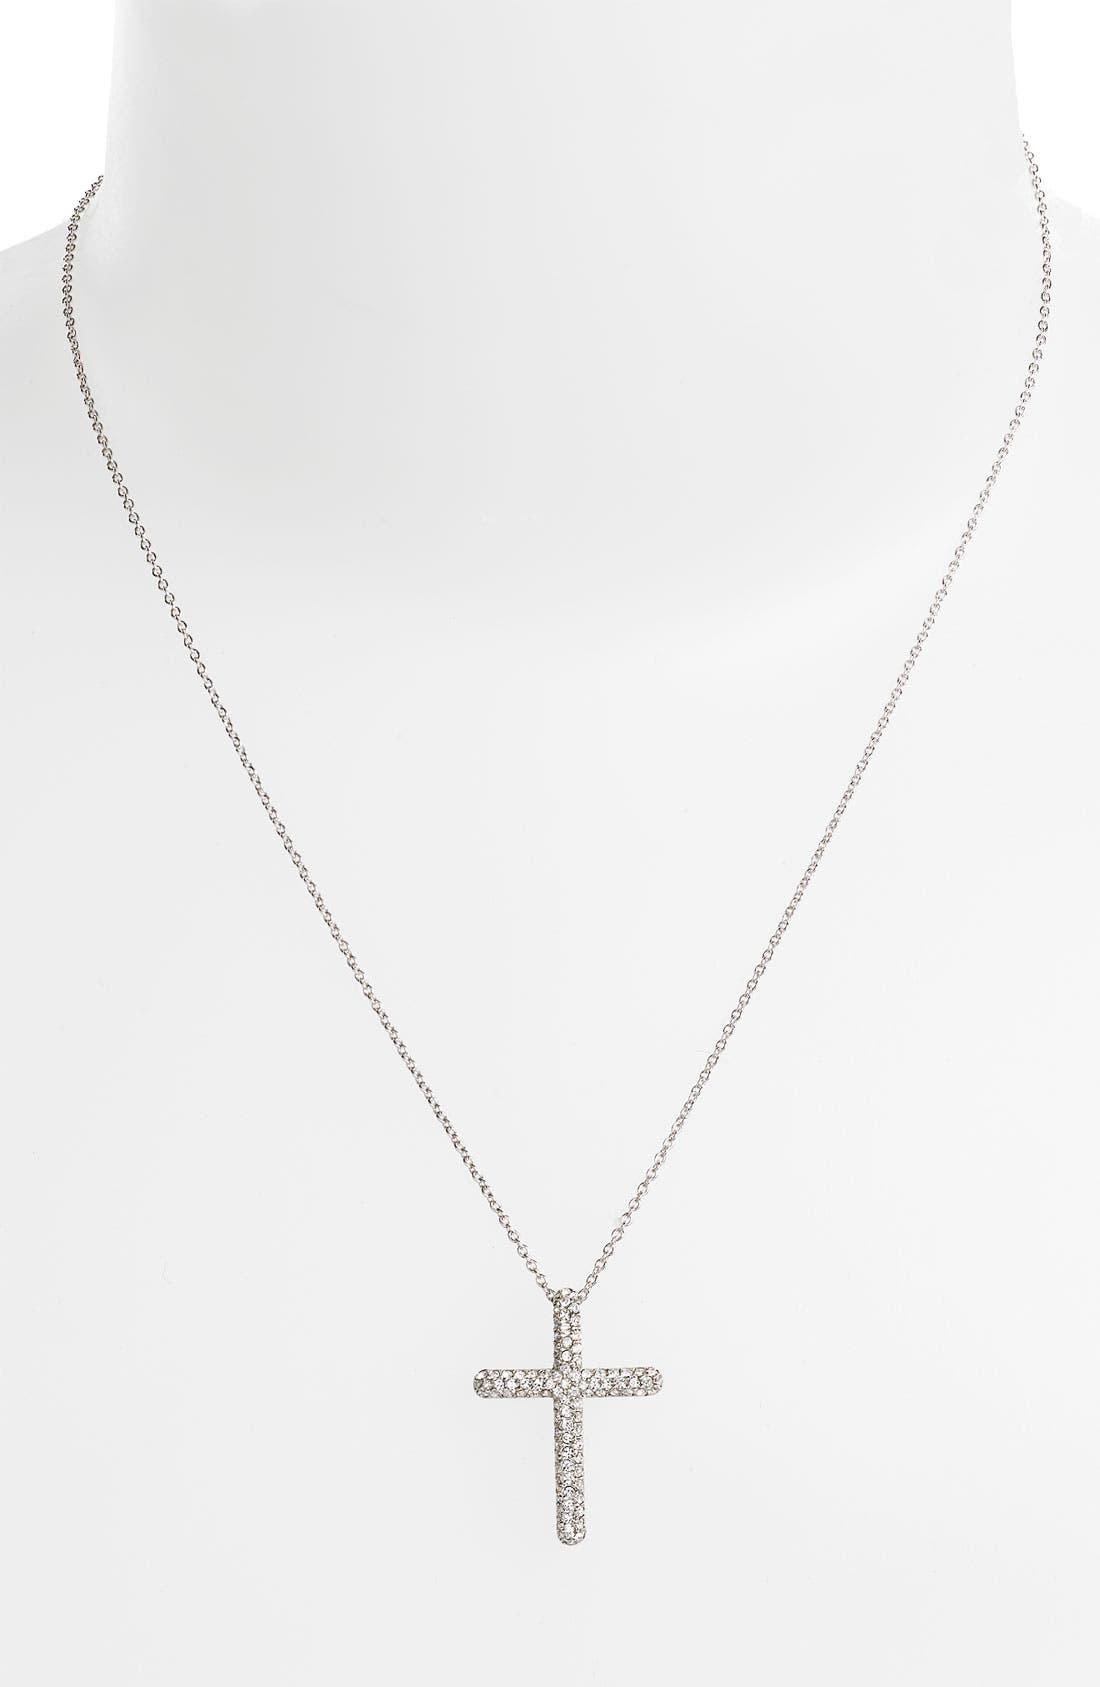 Main Image - Nadri Cross Pendant Necklace (Nordstrom Exclusive)